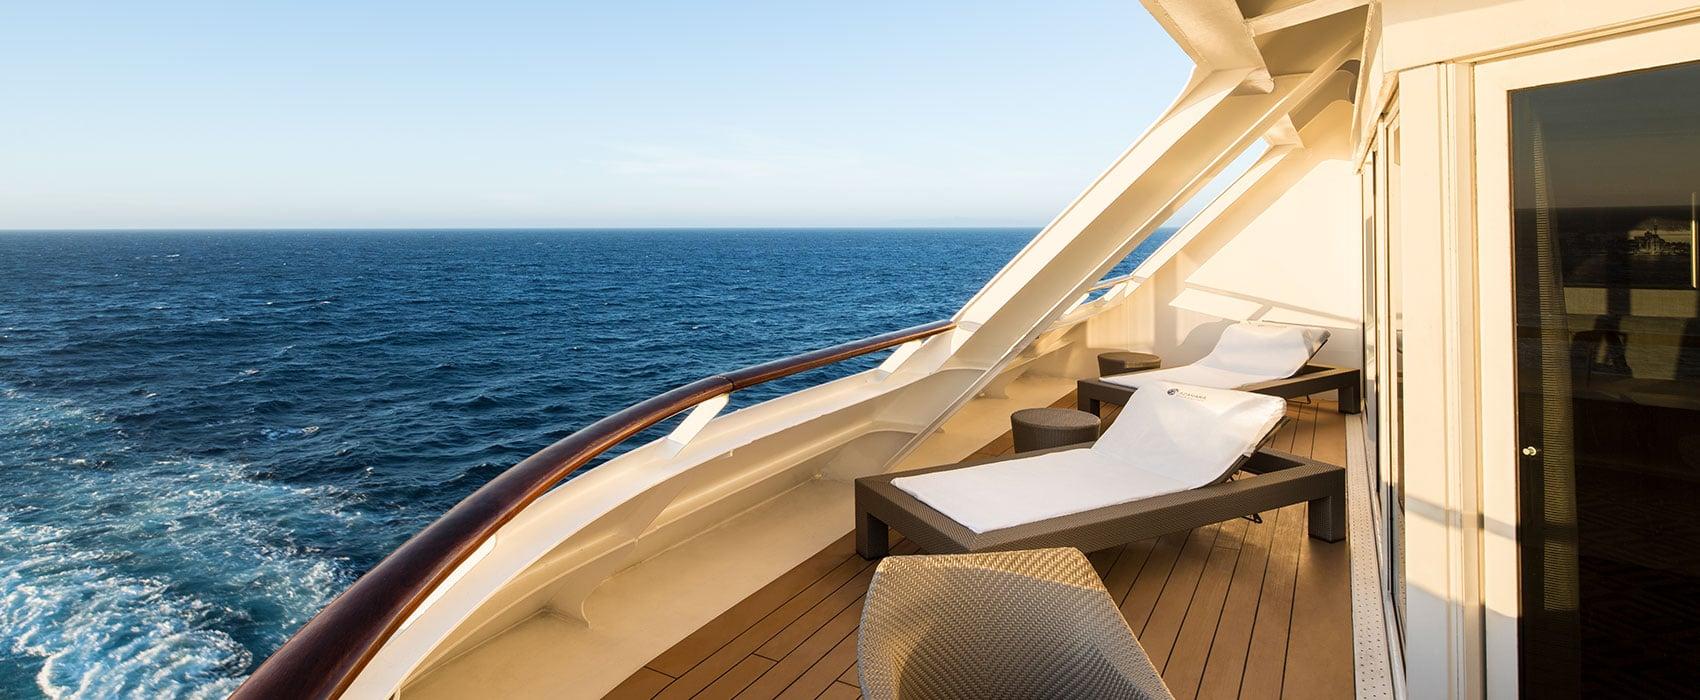 Desire Barcelona - Rome Cruise | Gallery